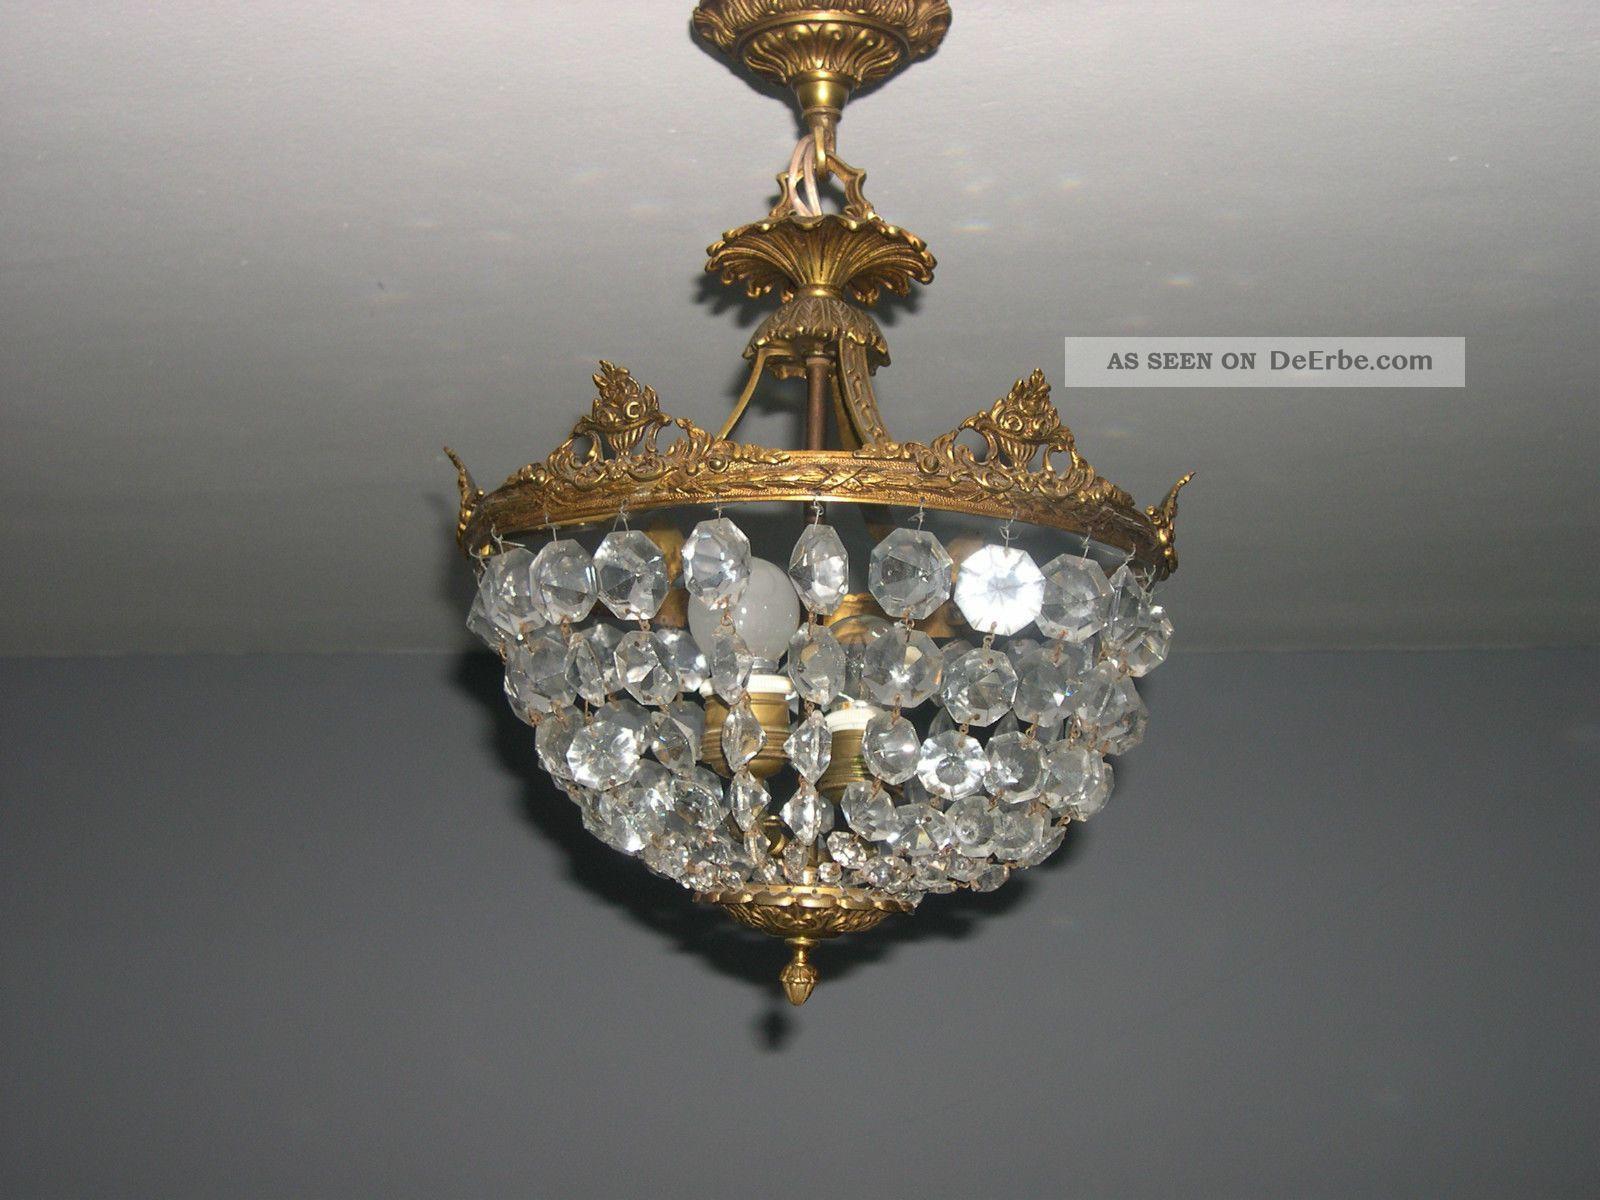 Plafoniere Kristall Antik : Jugendstil glas kristall deckenlampe plafoniere ca